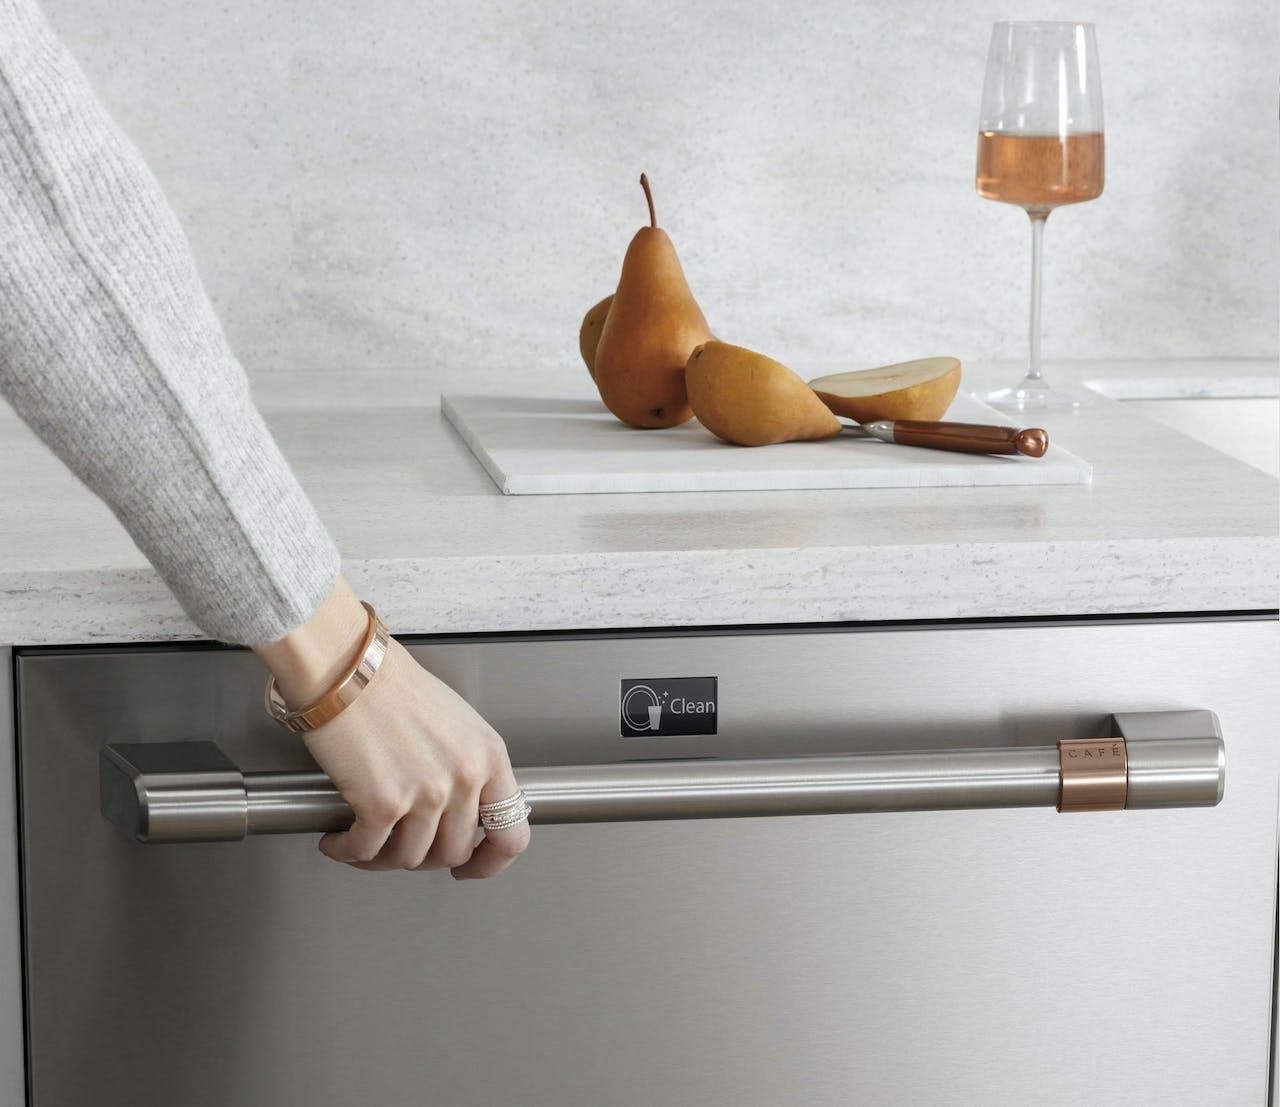 Opening a dishwasher